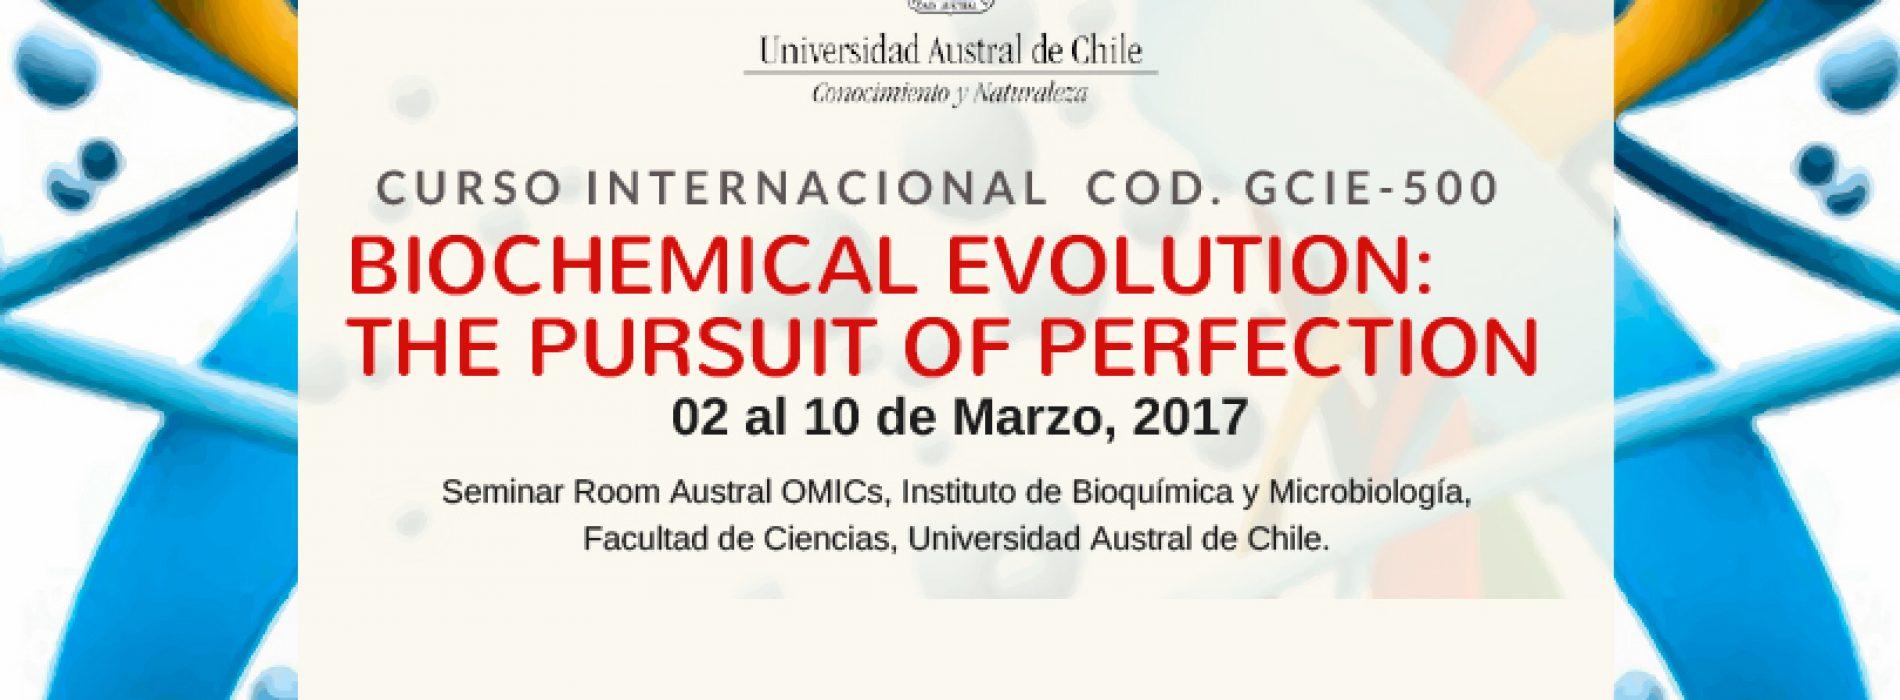 "Curso Internacional COD.GCIE-500. ""Biochemical Evolution: The Pursuit of Perfection"". 02 al 10 de Marzo, 2017"